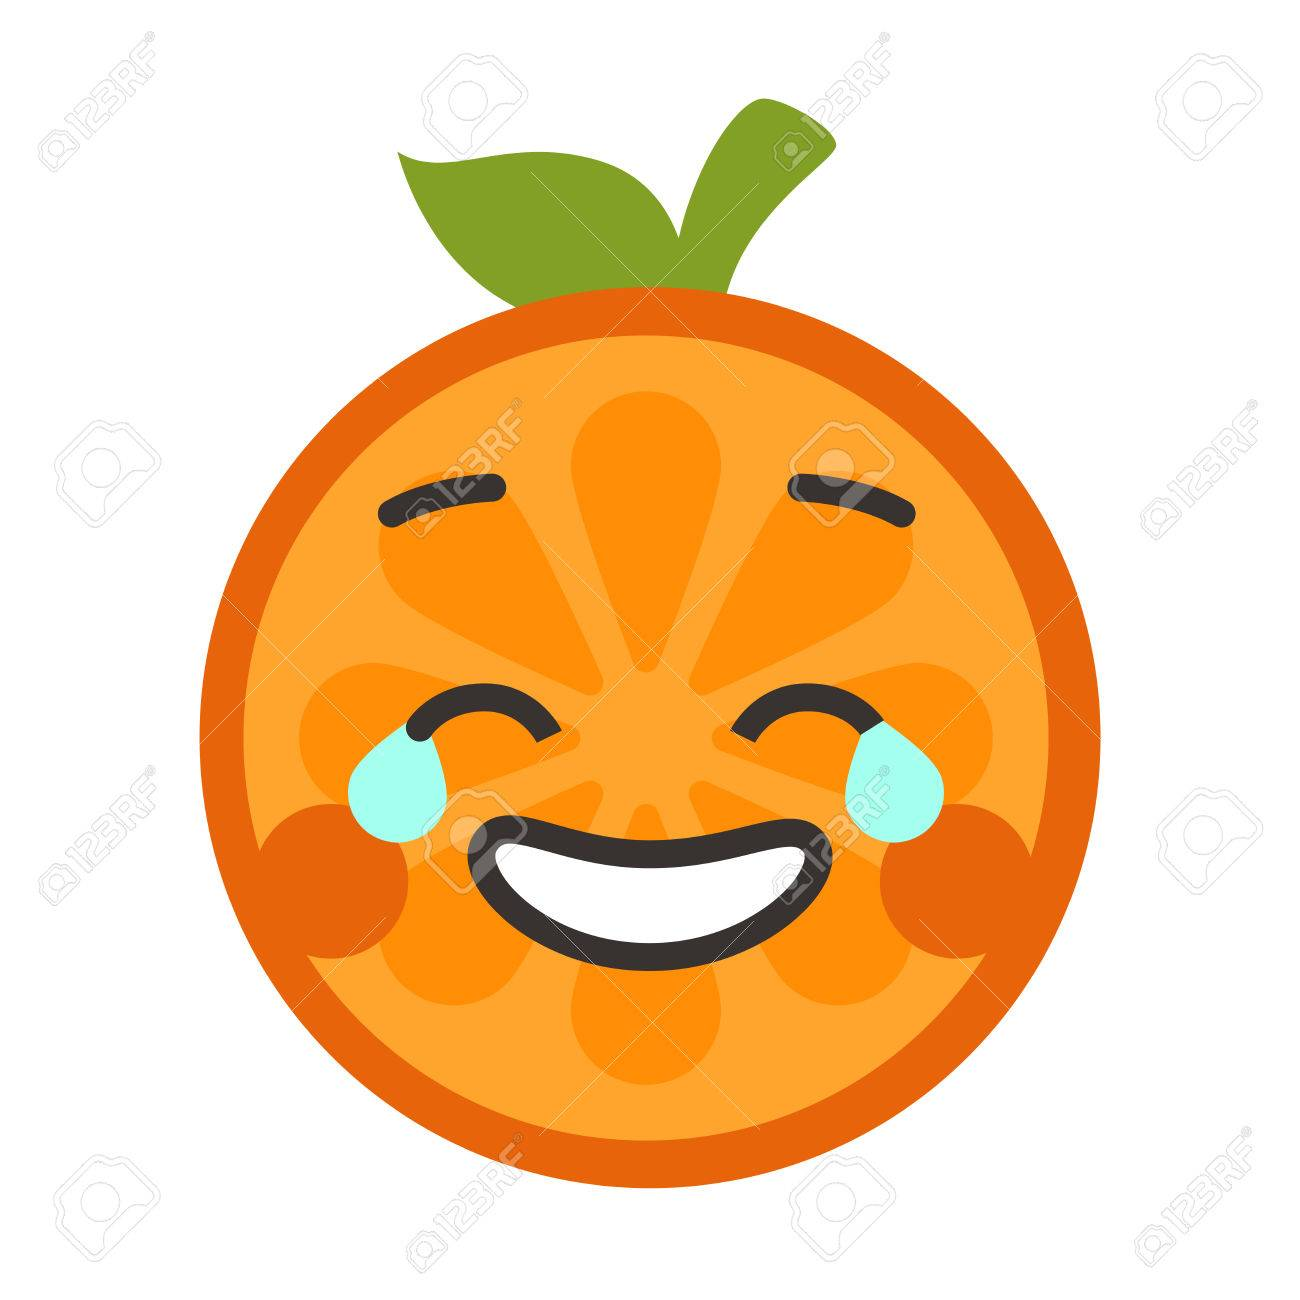 1300x1300 Laugh With Tears Emoji. Laughing With Tears Orange Fruit Emoji